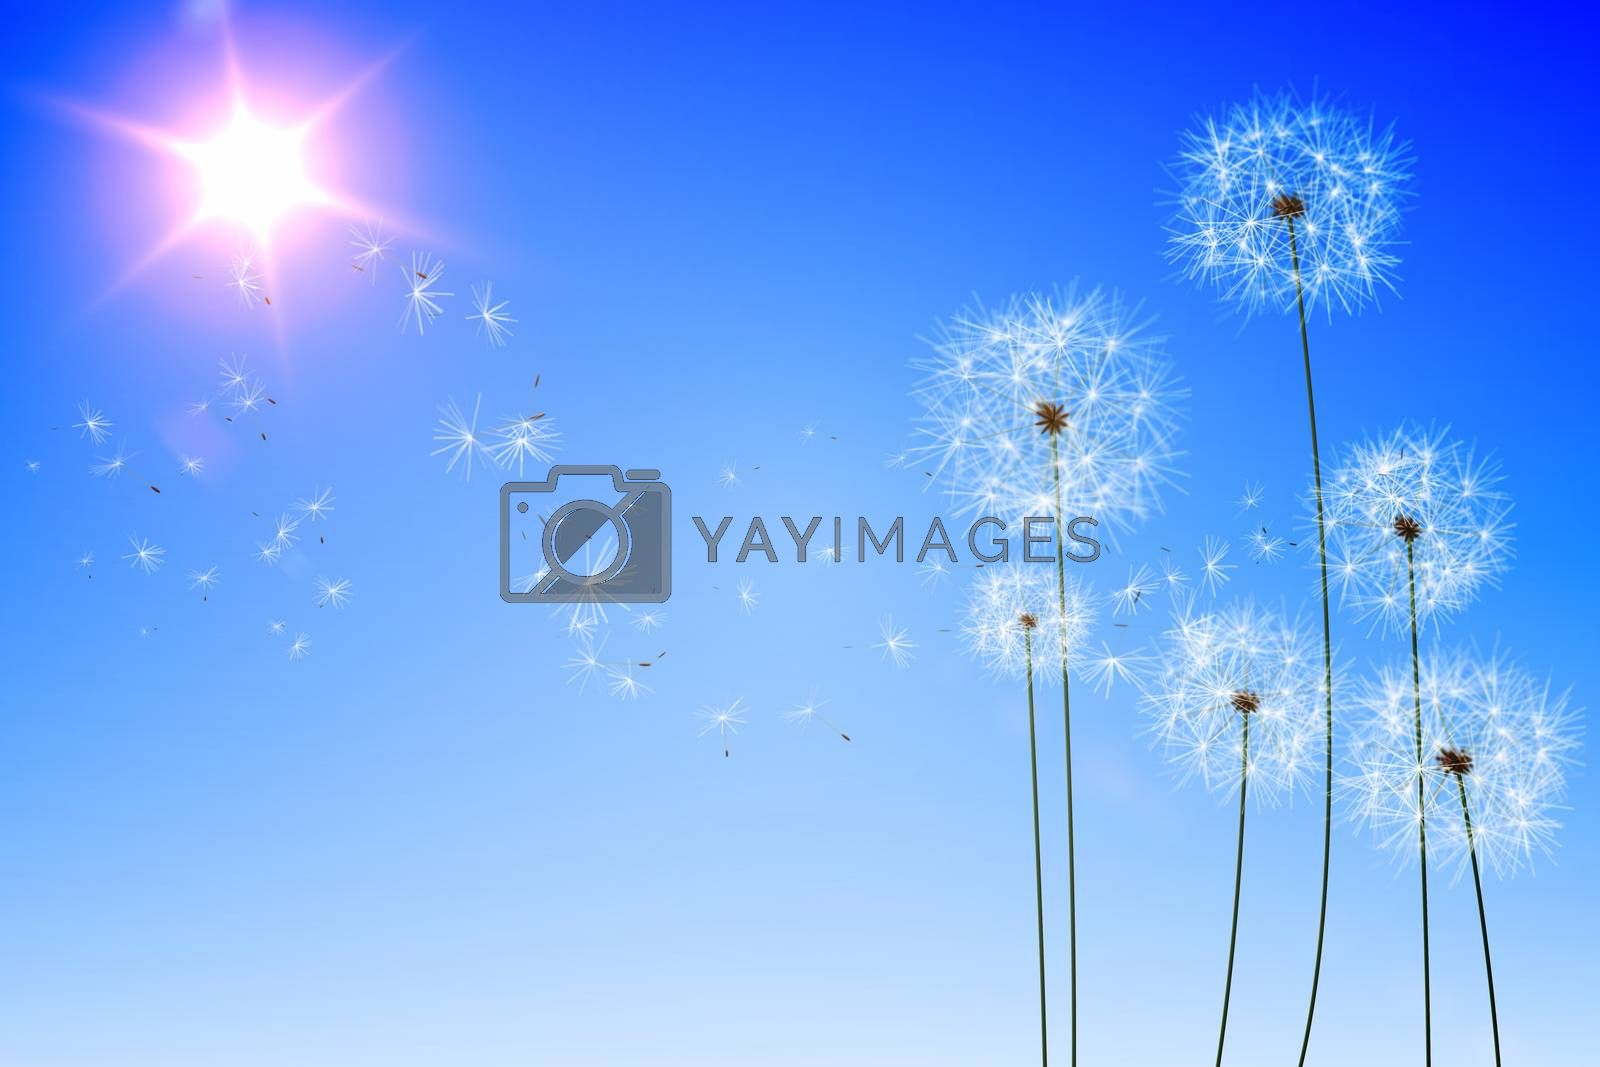 Royalty free image of Digitally generated dandelions against blue sky by Wavebreakmedia